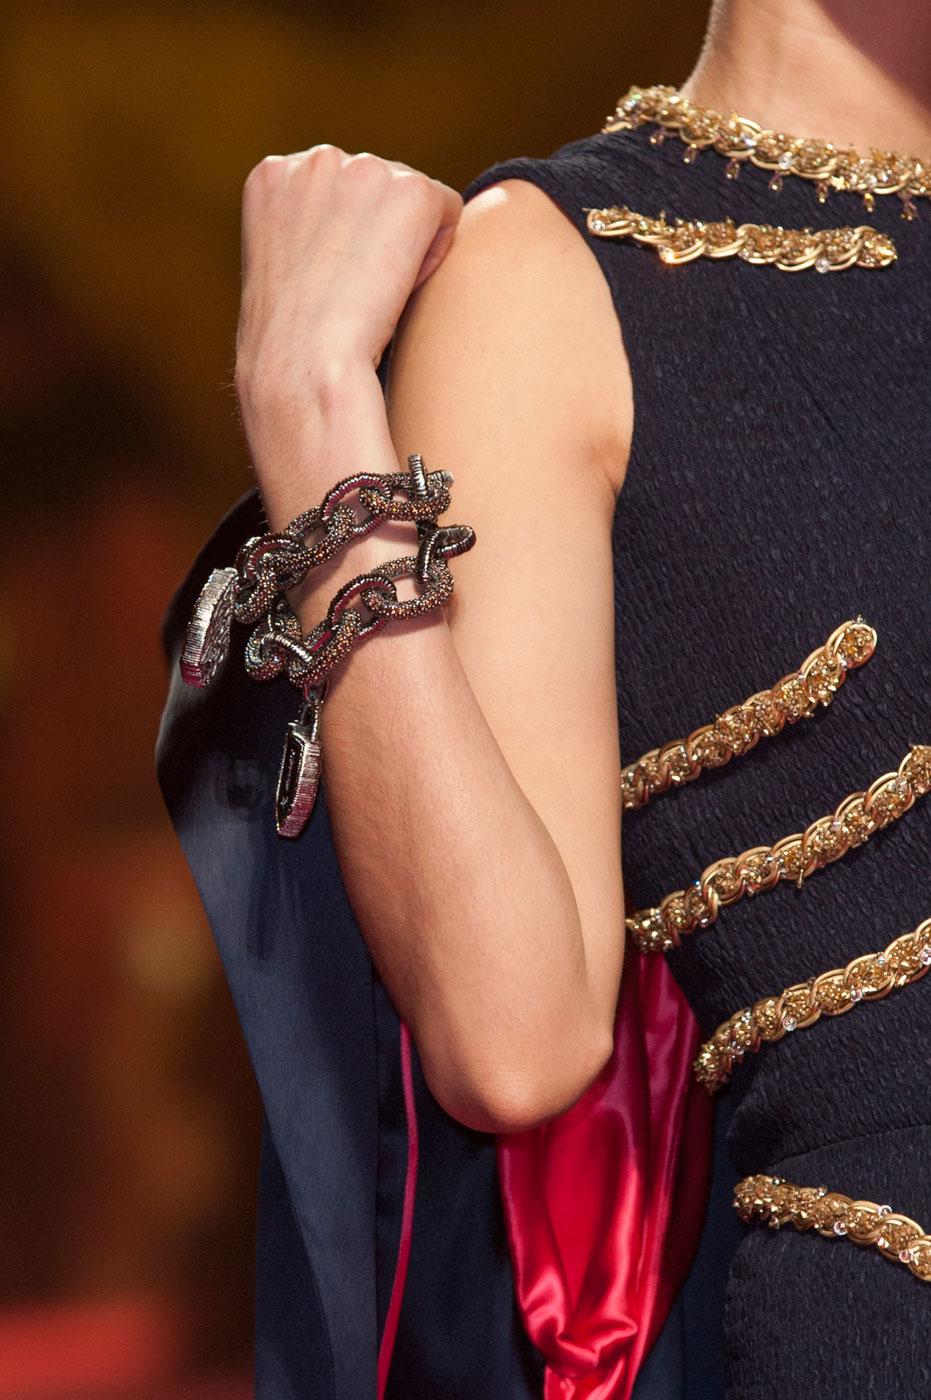 Schiaparelli-fashion-runway-show-close-ups-haute-couture-paris-spring-summer-2015-the-impression-12